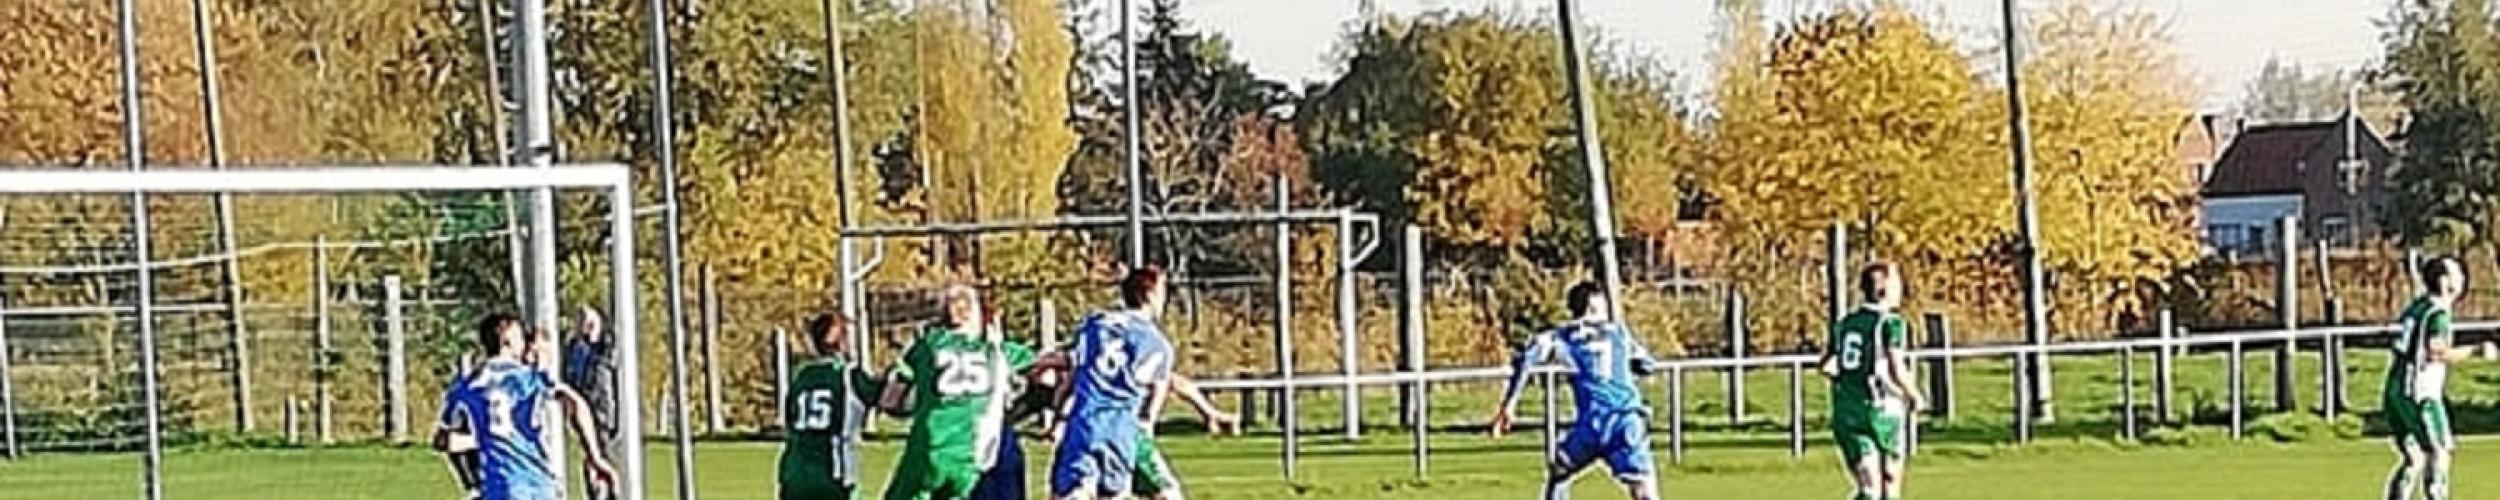 Voorbereiding 1e Elftal & beloften seizoen 2020-2021